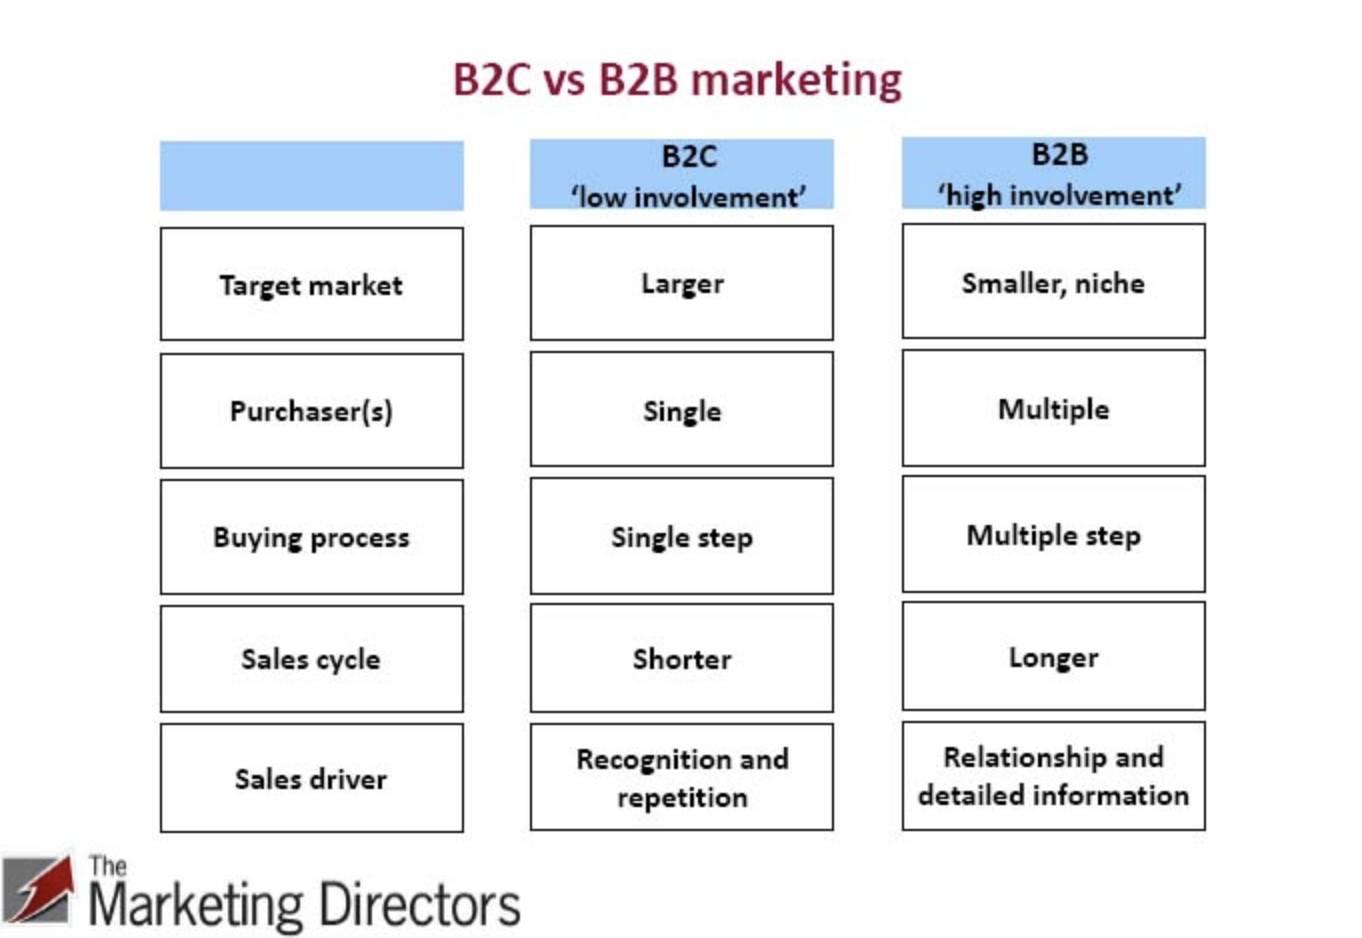 B2B vs B2C customer experience journey map